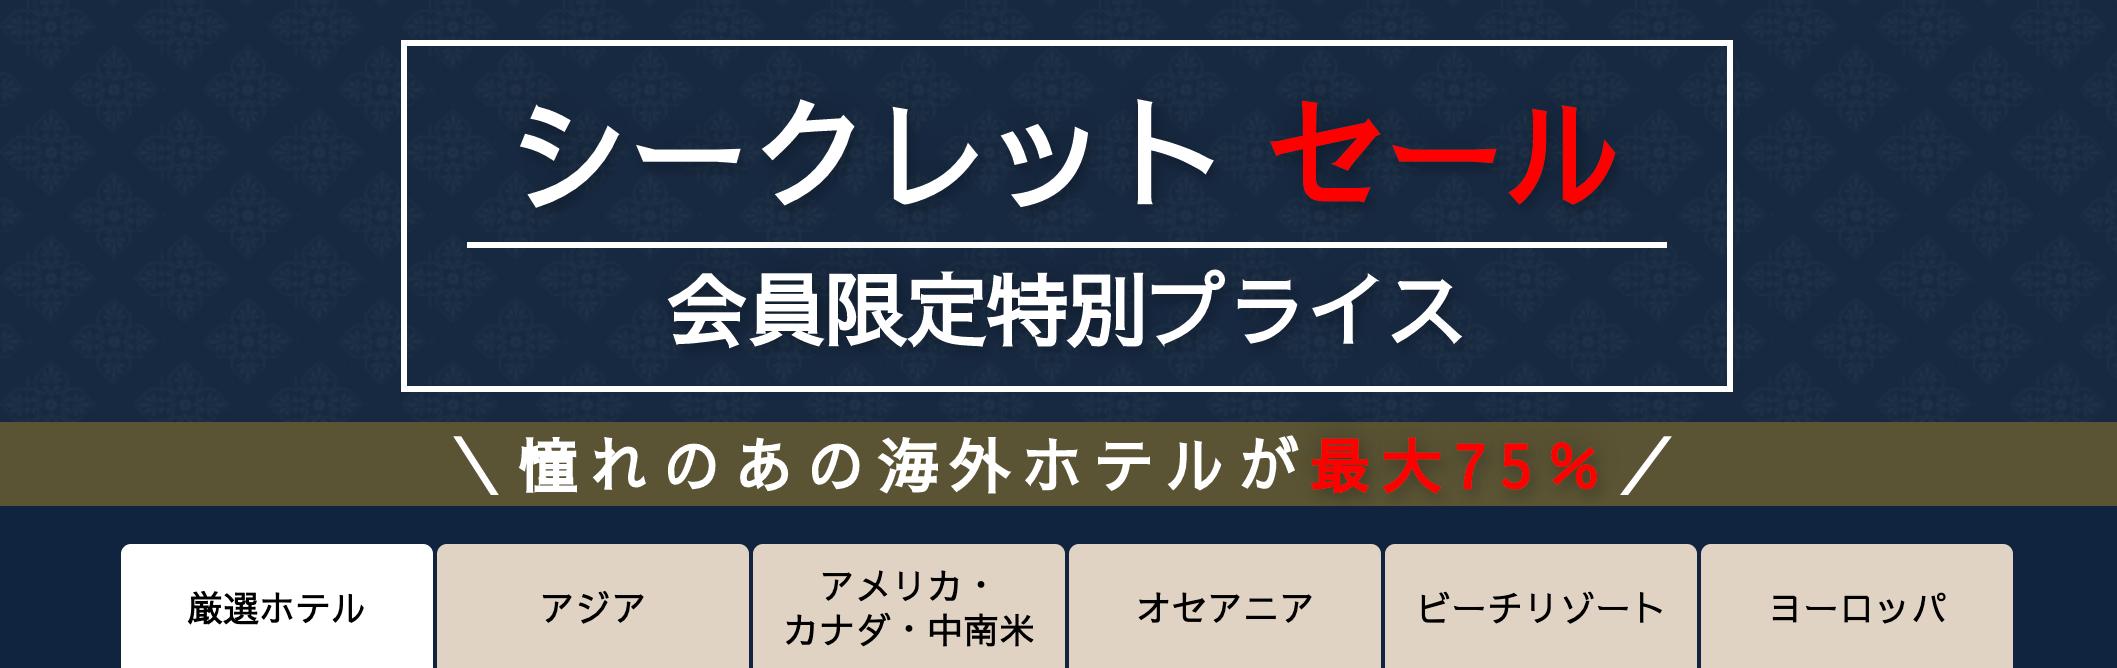 日本旅行会員限定のセール情報